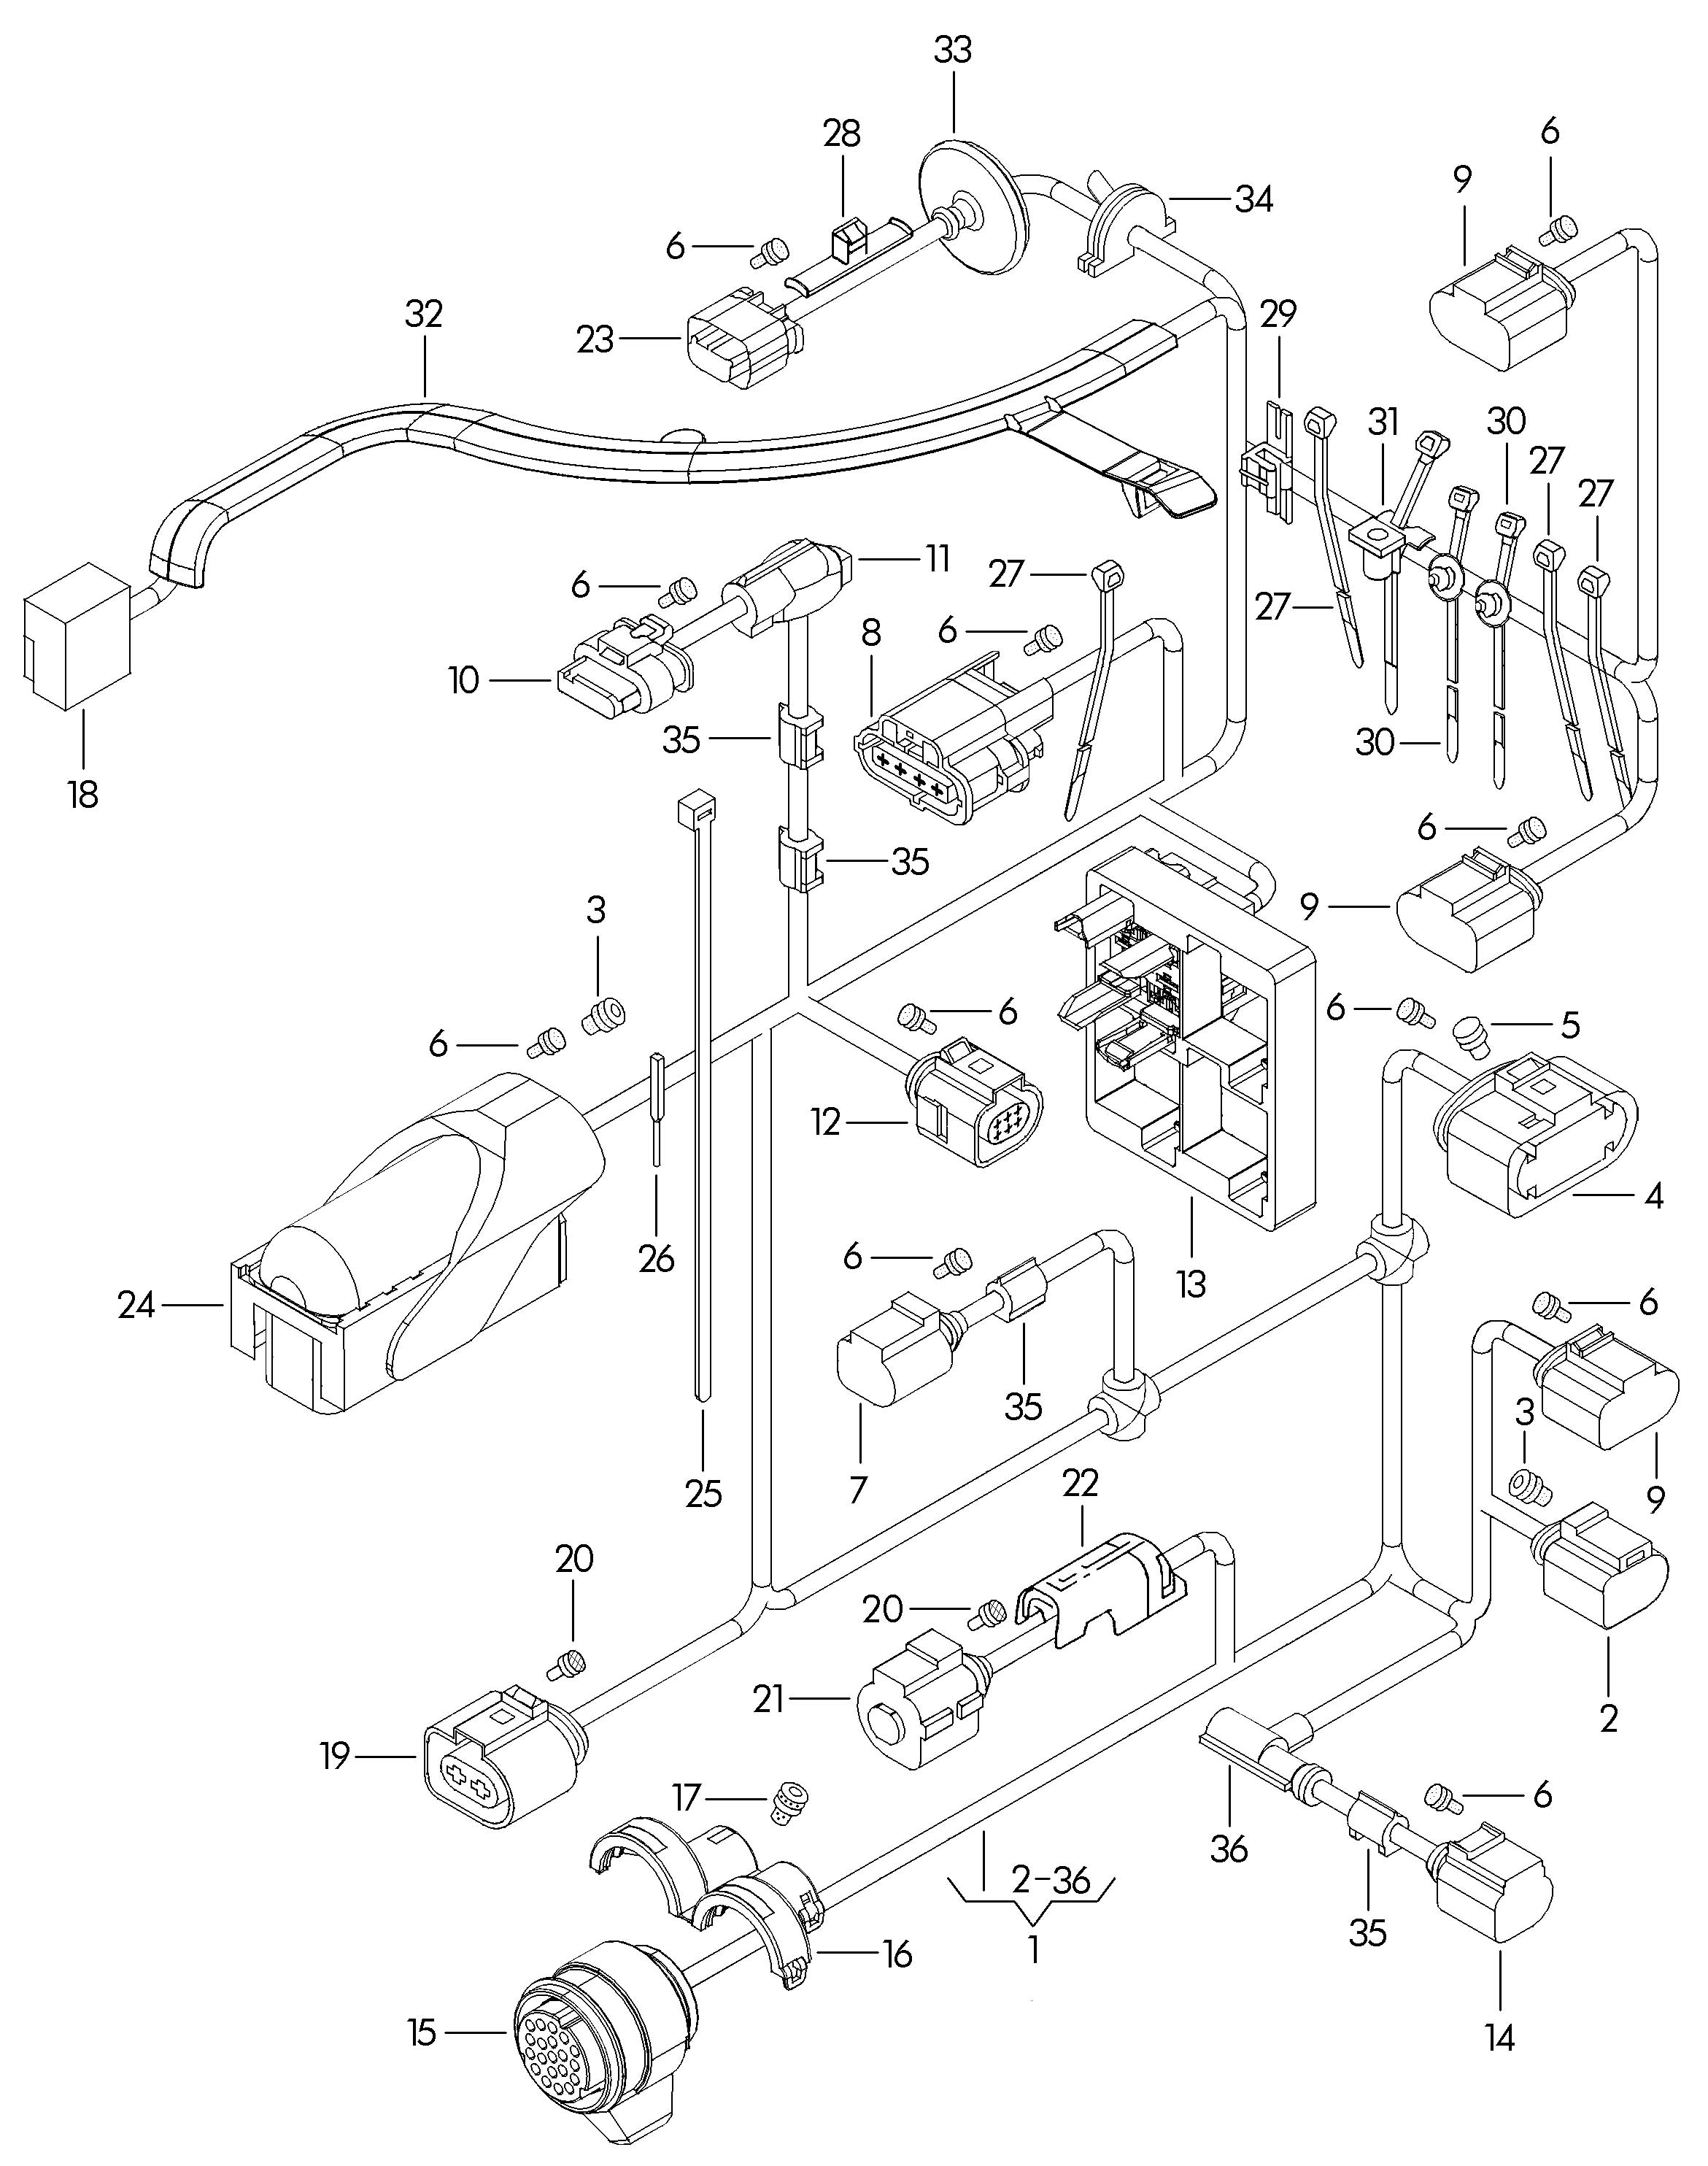 1971 Vw Transporter Wiring Diagram. Diagram. Auto Wiring